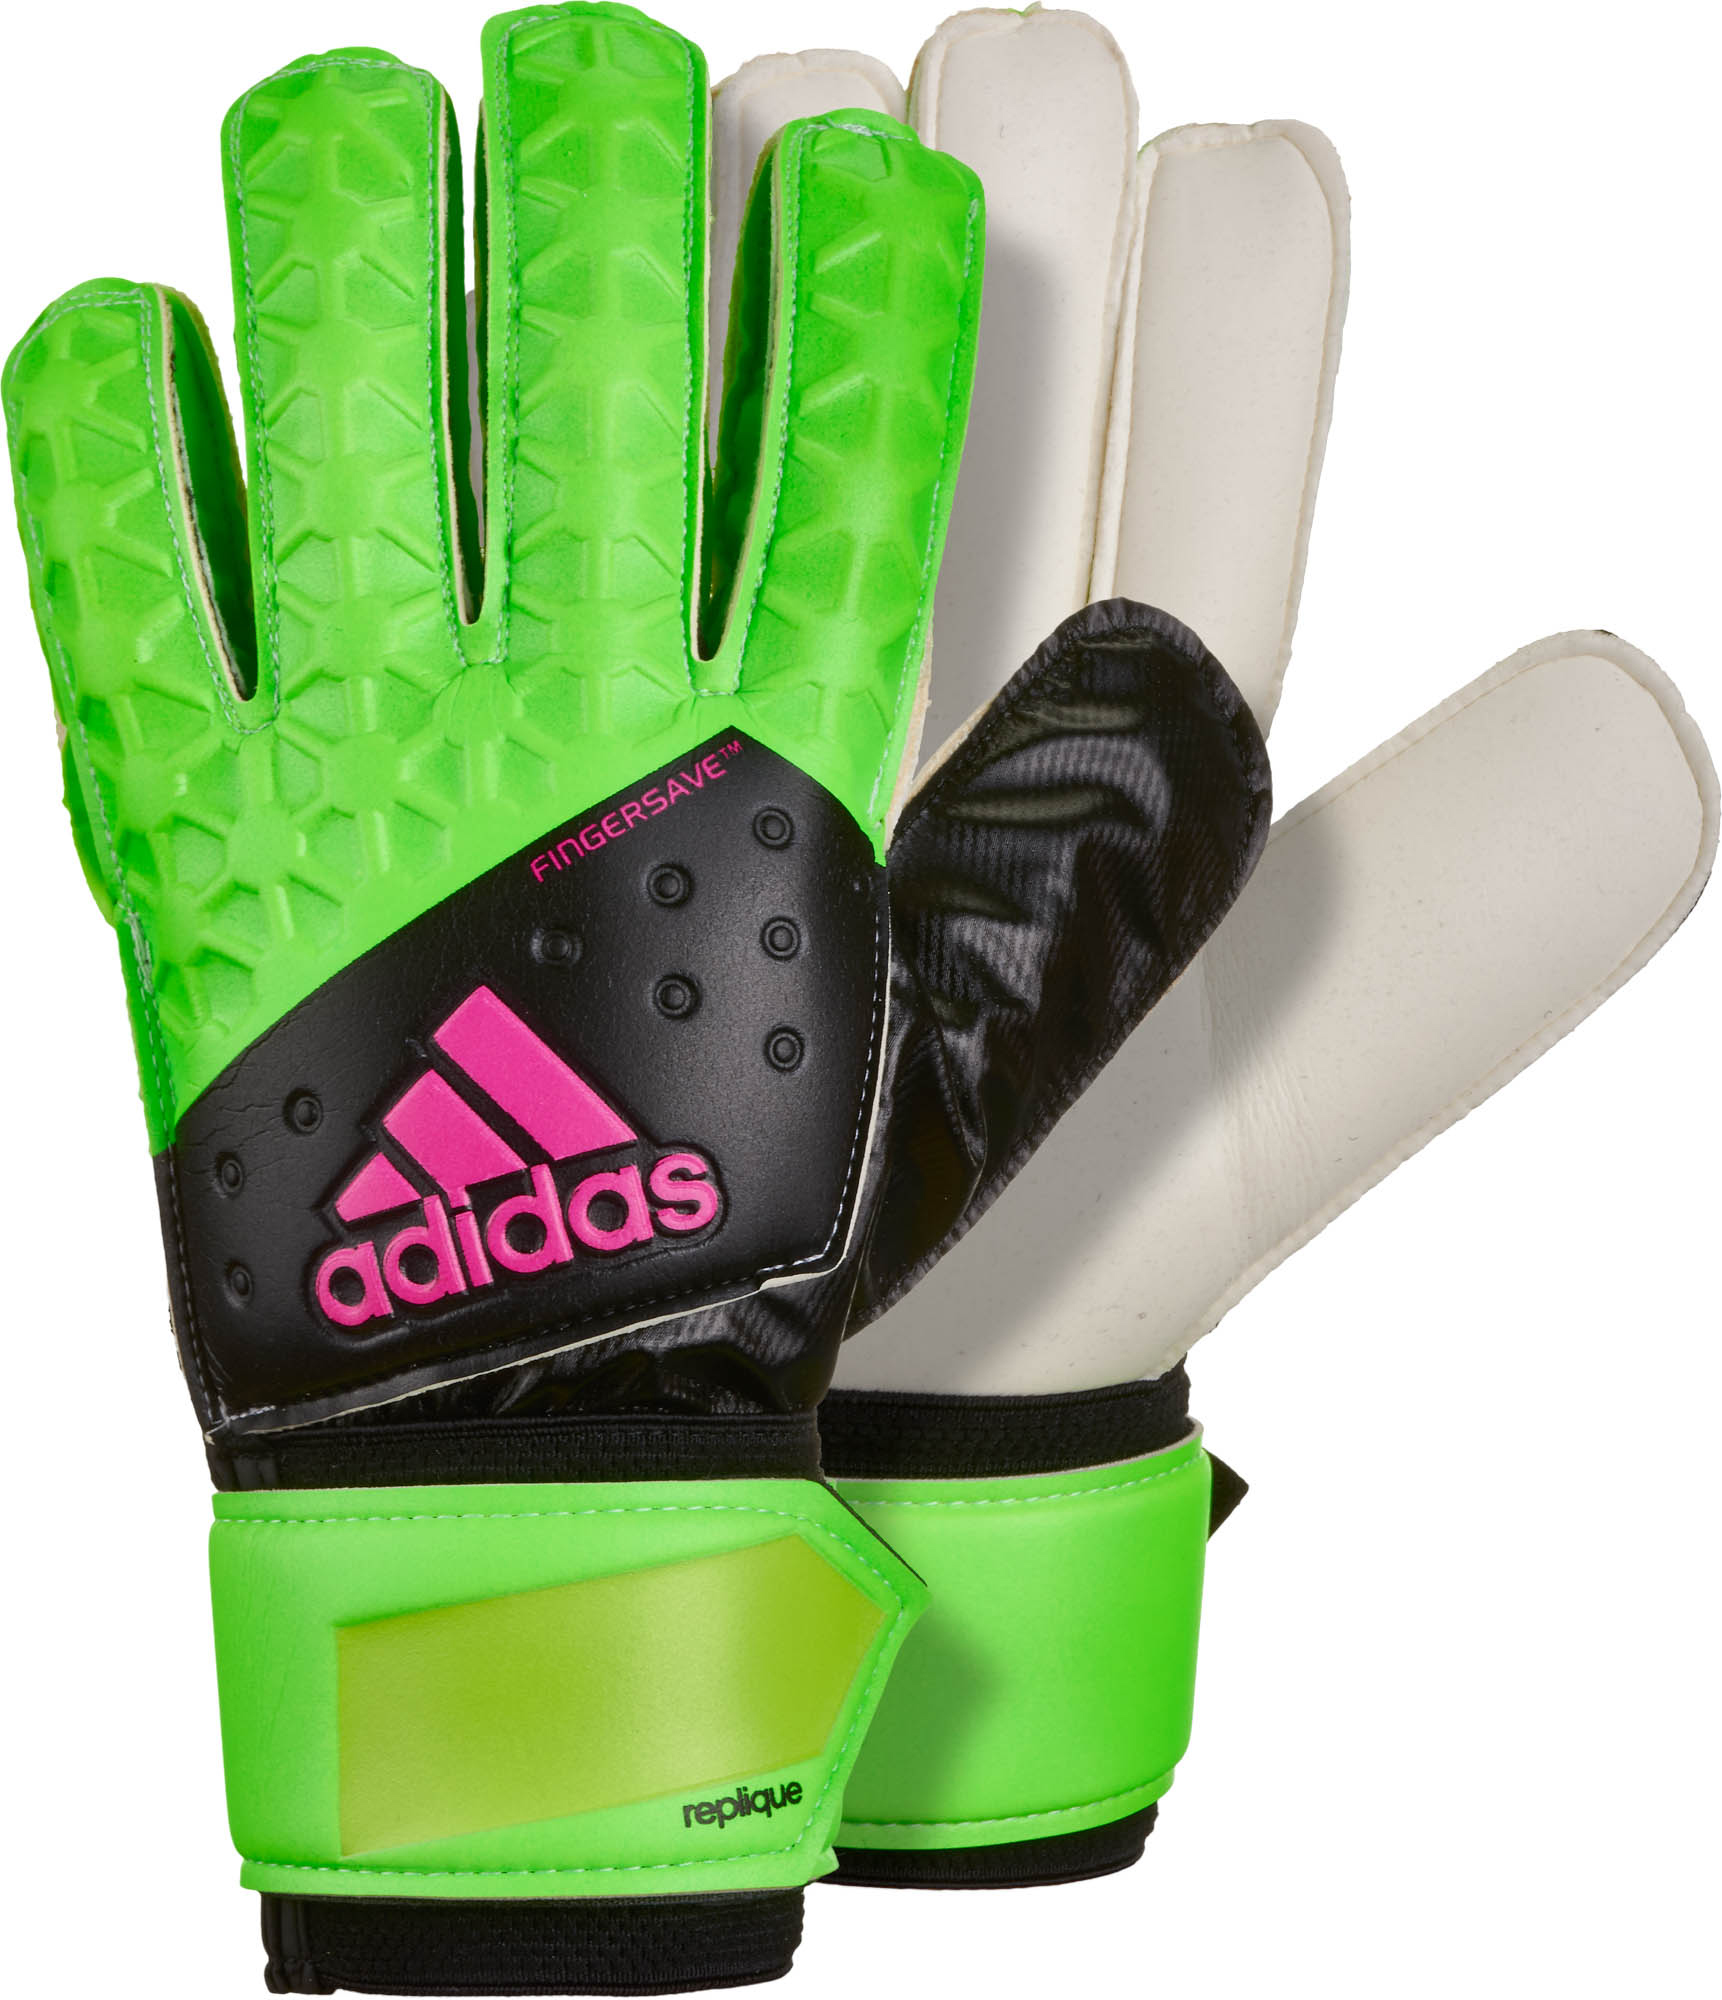 adidas ACE Fingersave Replique- Green Goalkeeper Gloves